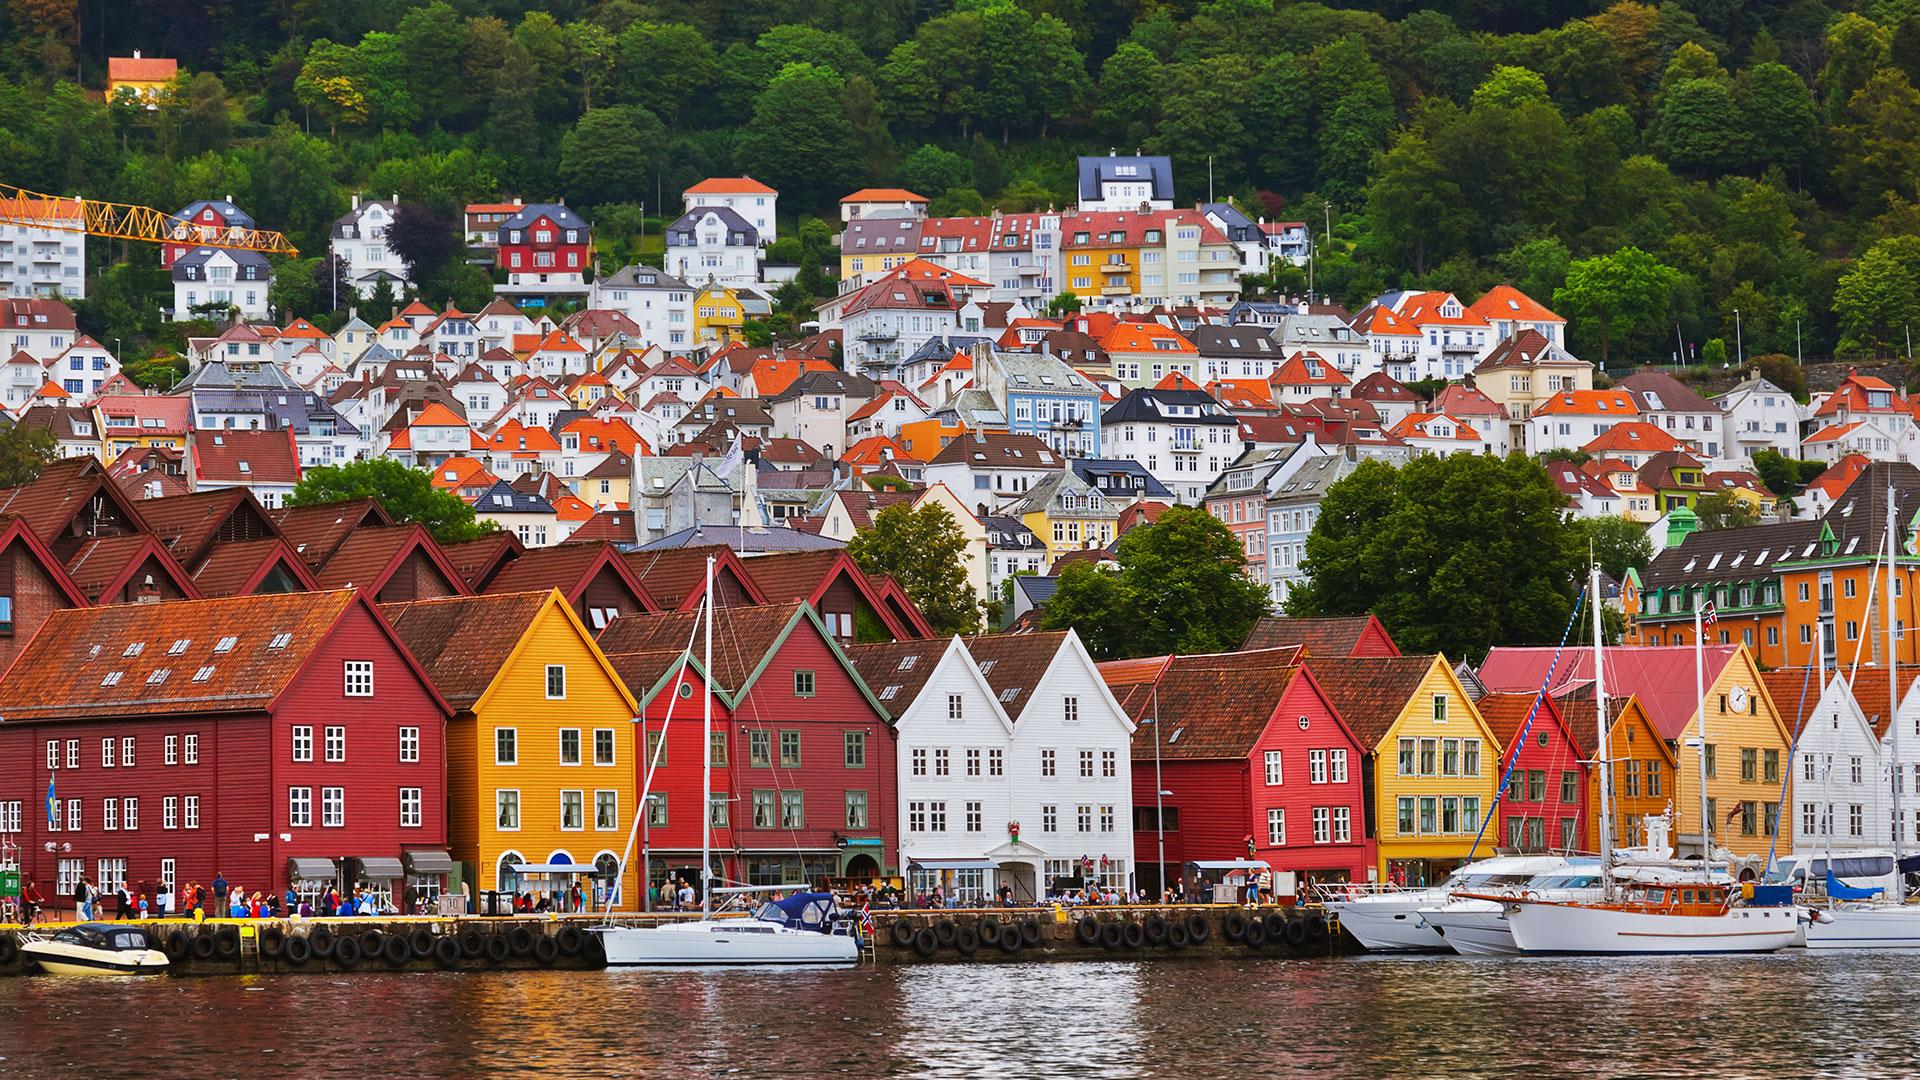 Țările Nordice: Suedia – Norvegia - Danemarca